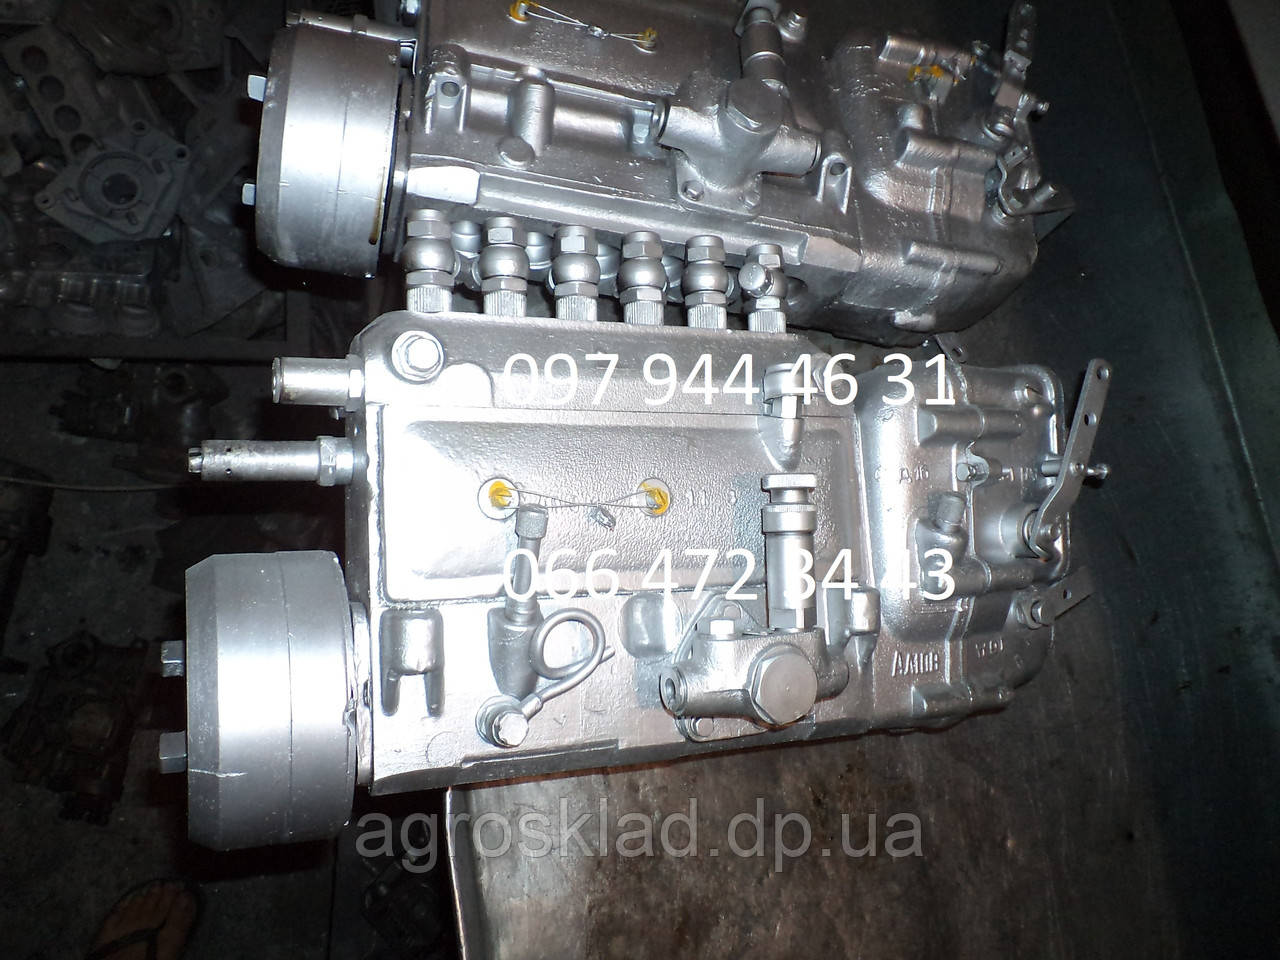 ТНВД ЯМЗ-236 - Agrosklad в Днепре